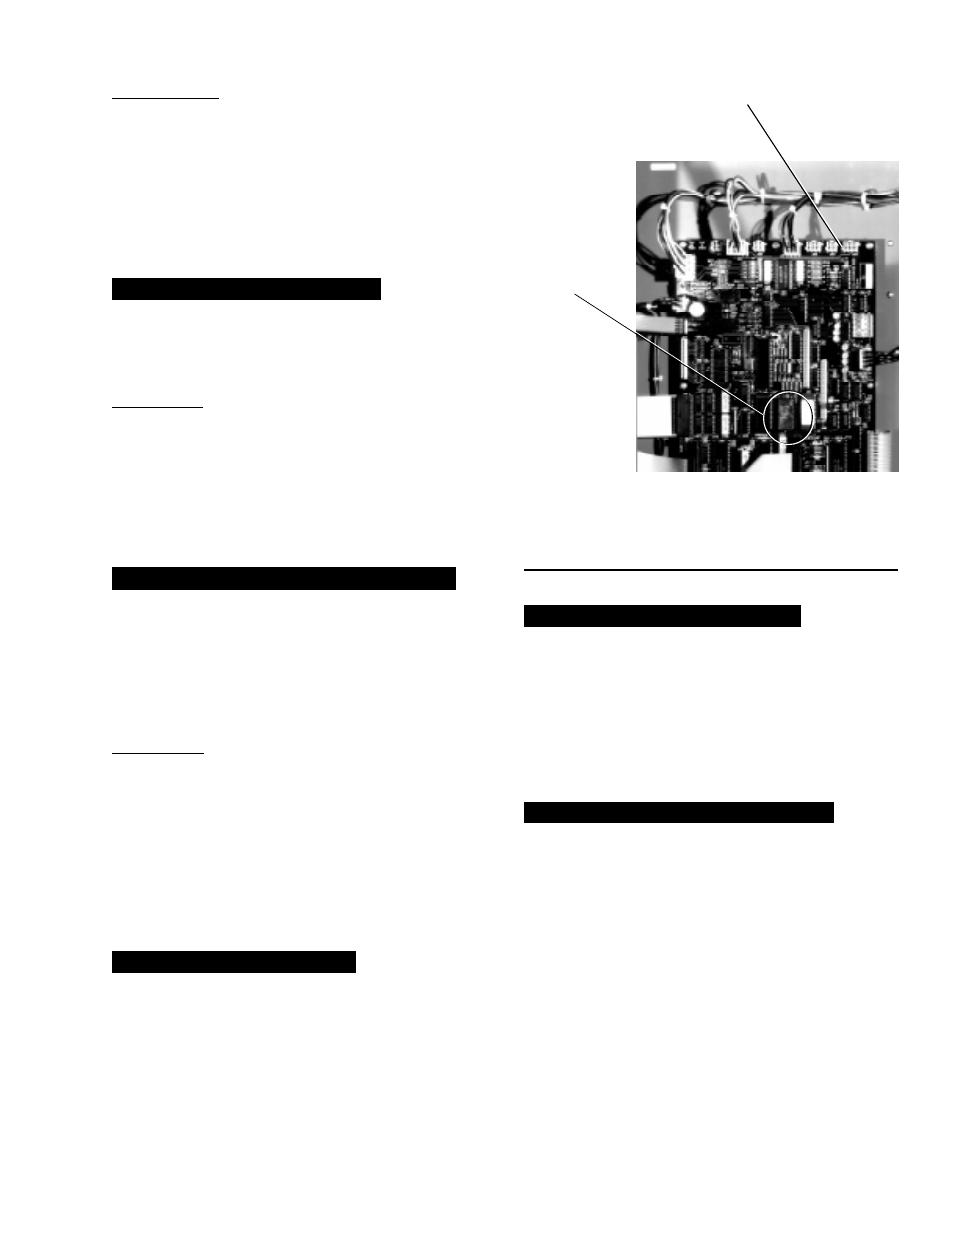 york millennium yk m3 m3 g4 thru yk s6 s4 j2 user manual page 29 rh manualsdir com York Chiller Troubleshooting Guide york millenium recip chiller manual